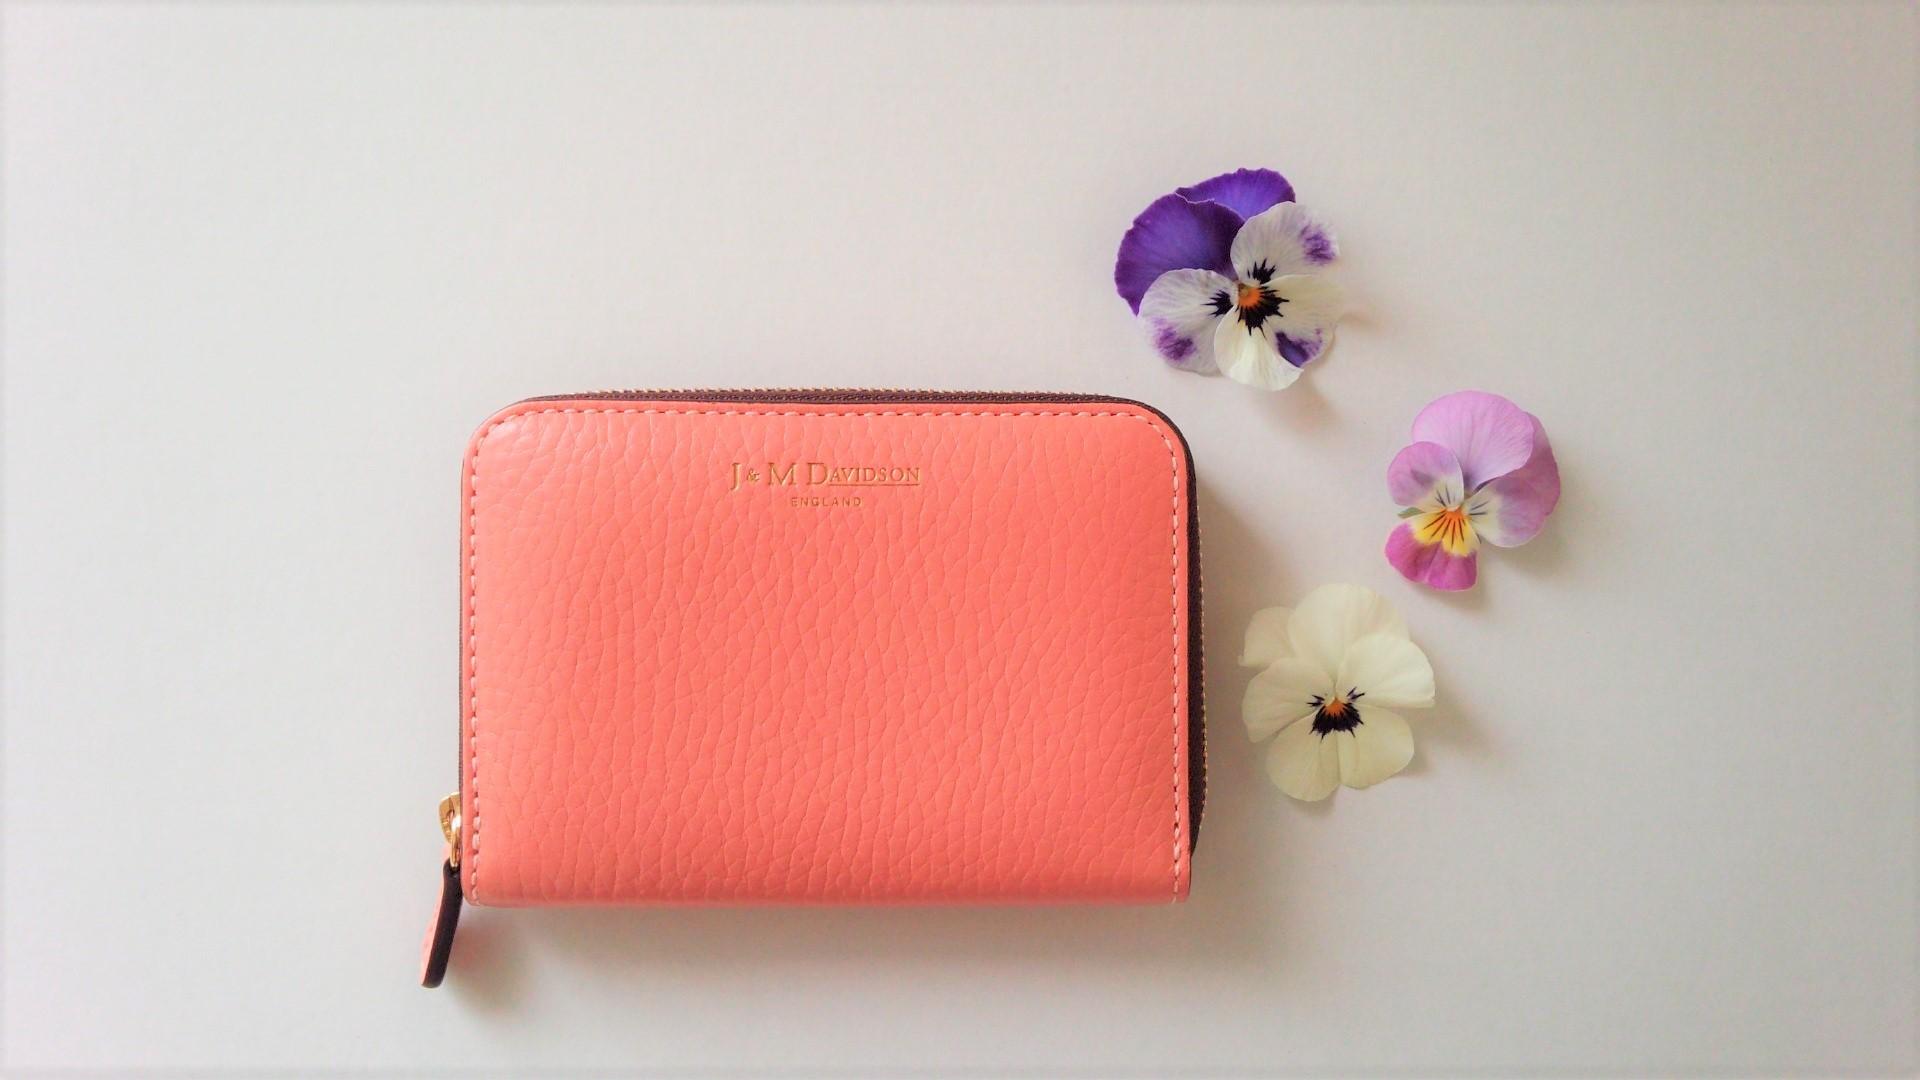 NEXT財布はミニサイズ_1_1